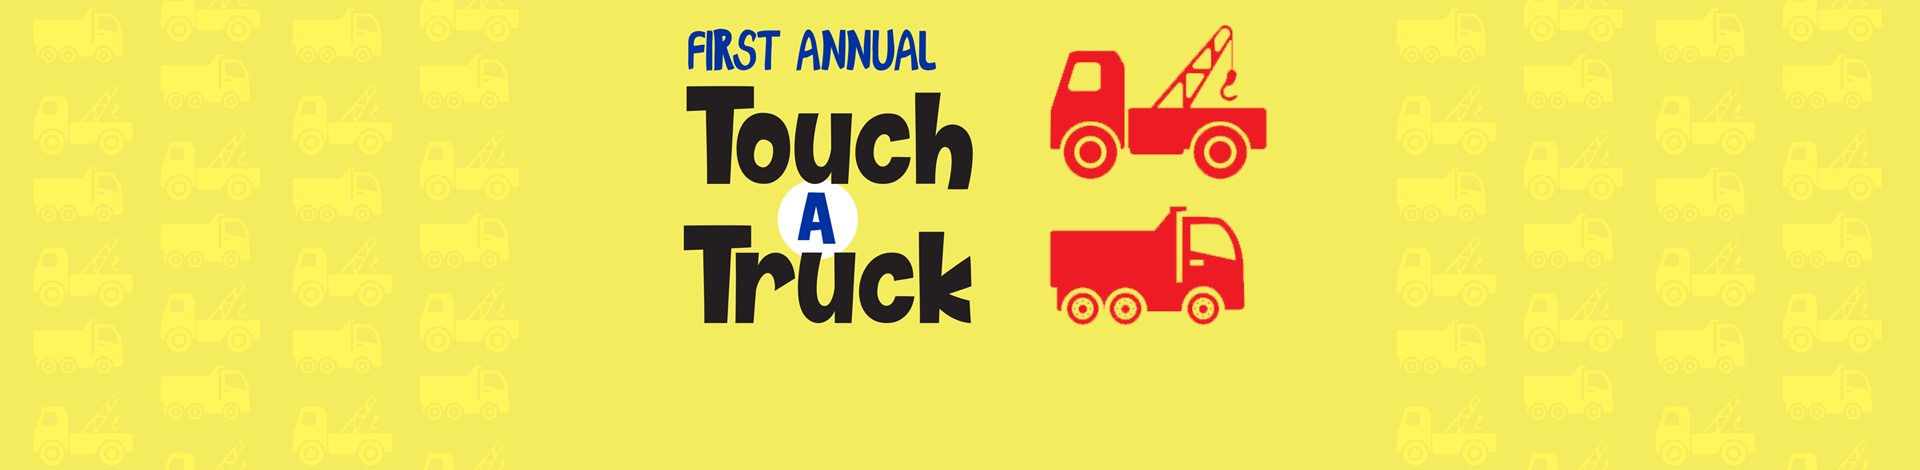 Touch-a-Truck-Slide1